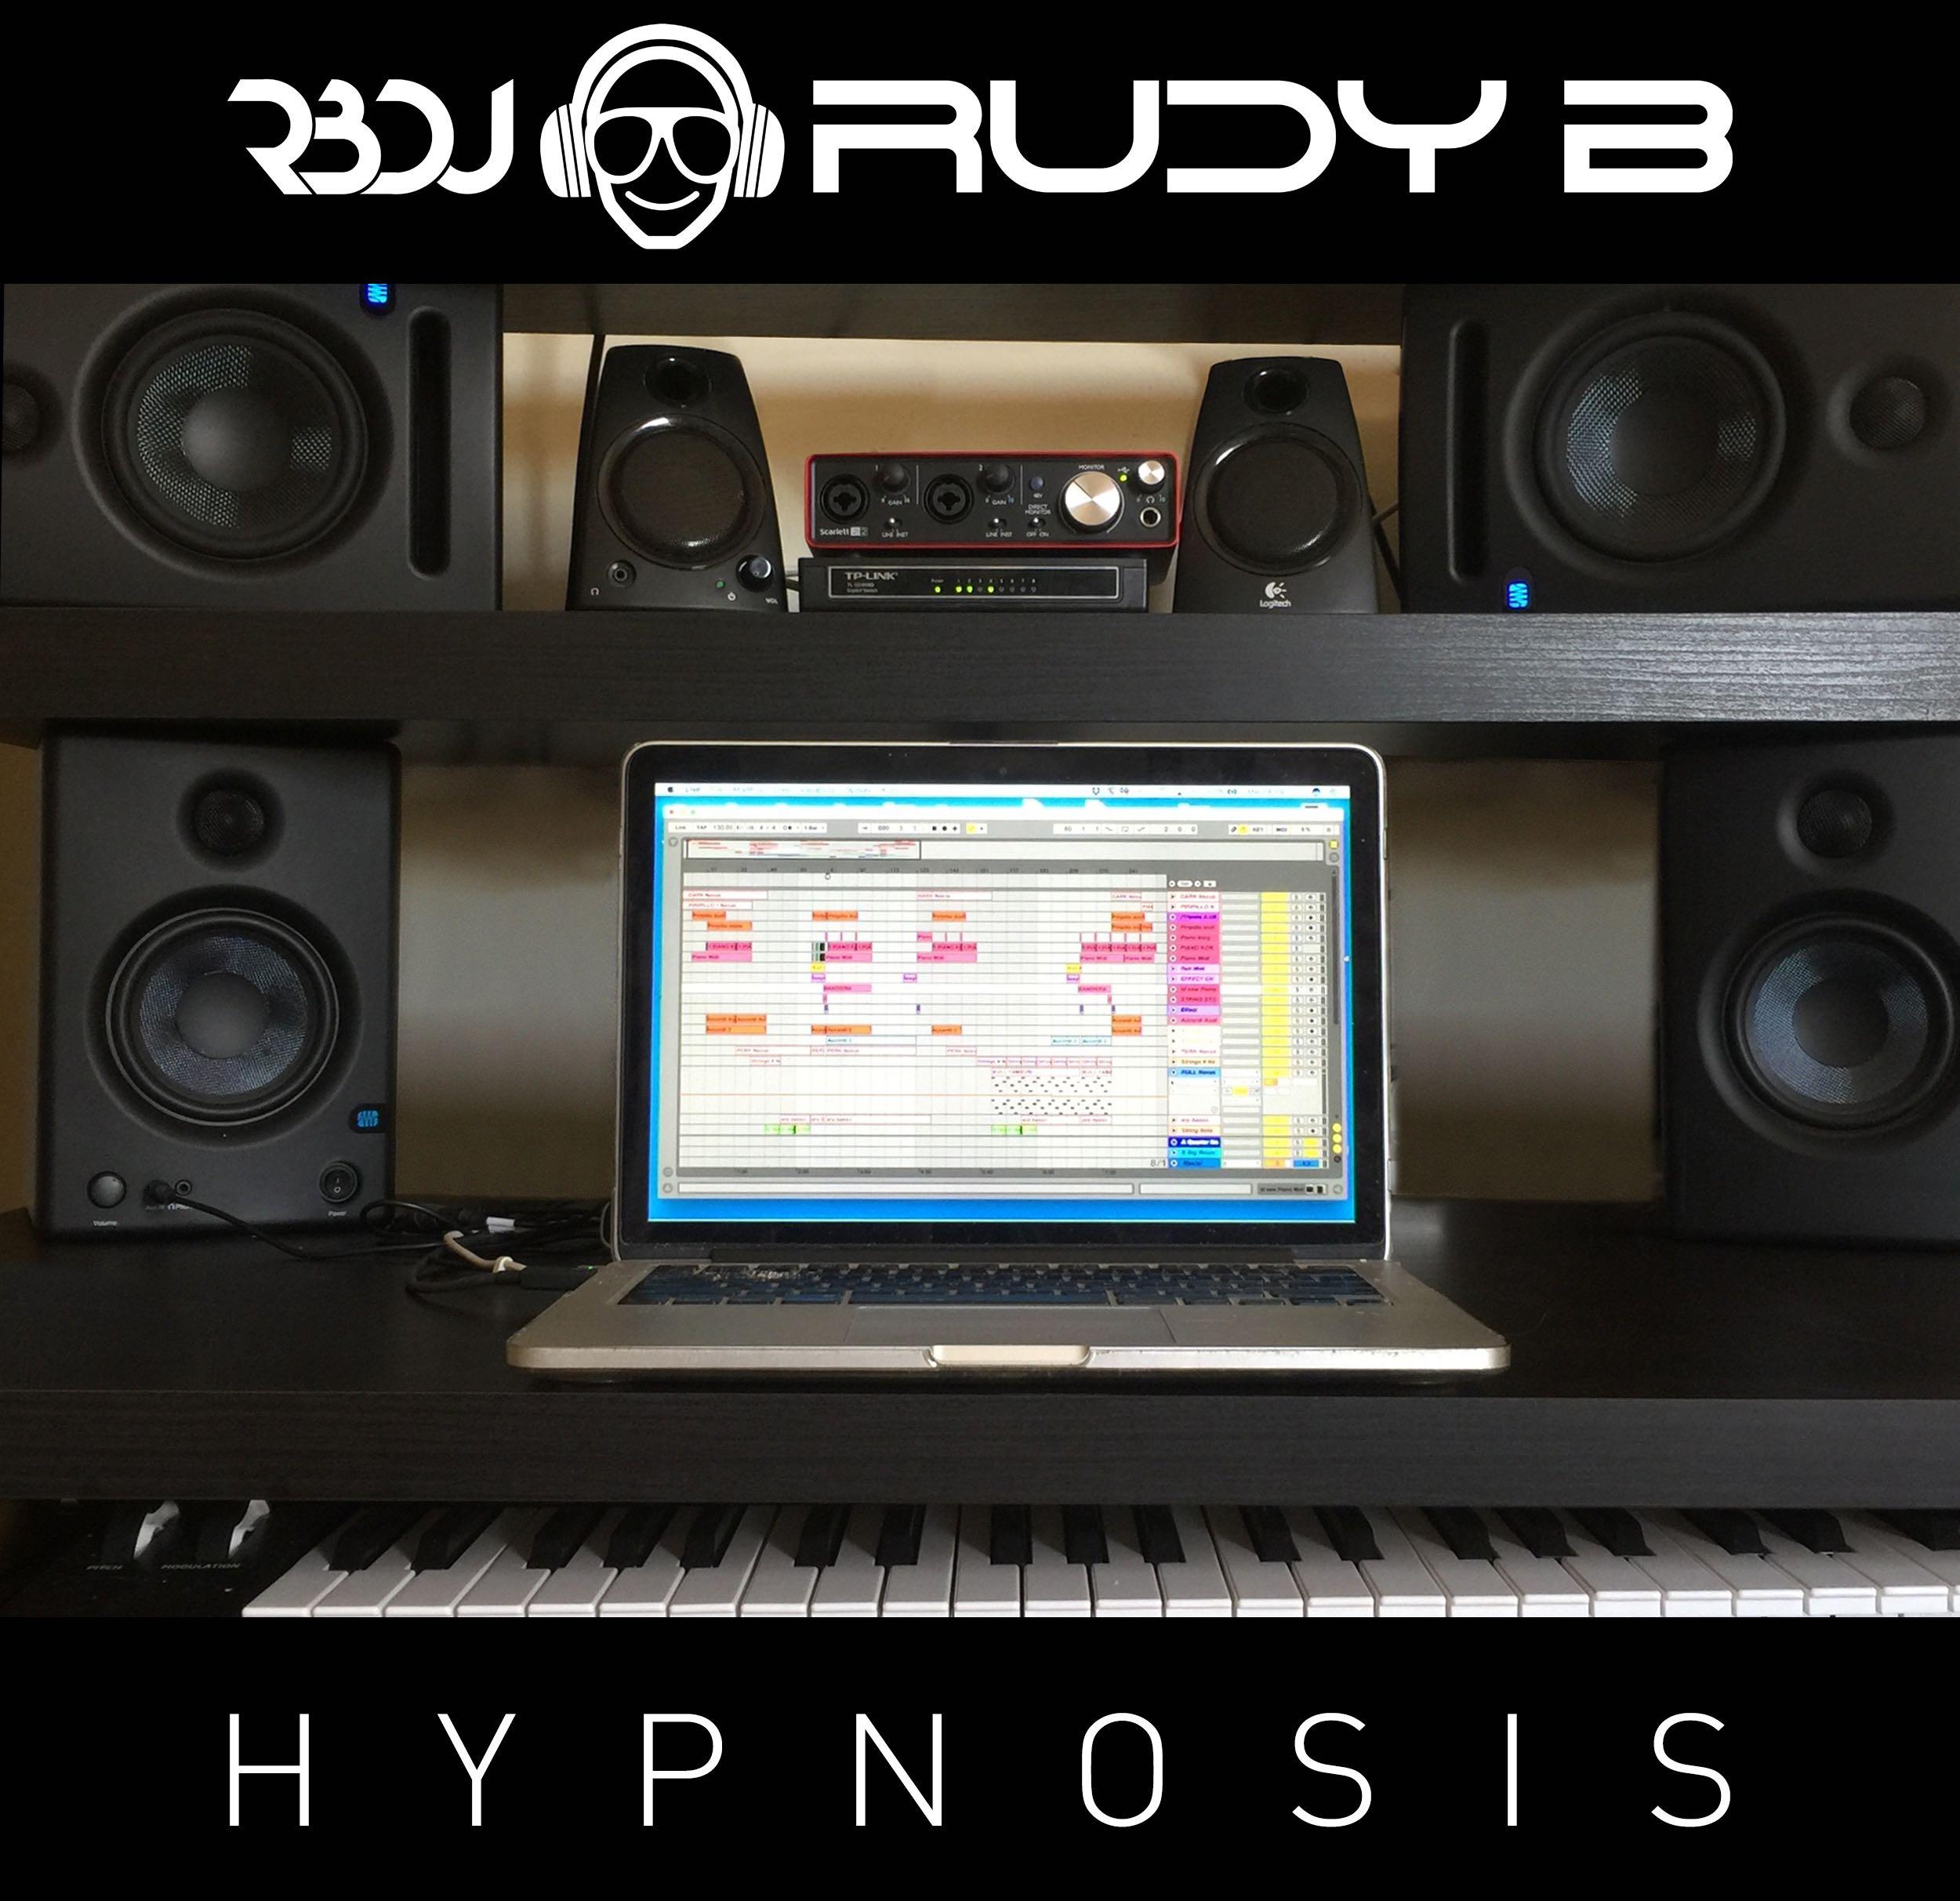 hypnosis2 RUDYBDJ